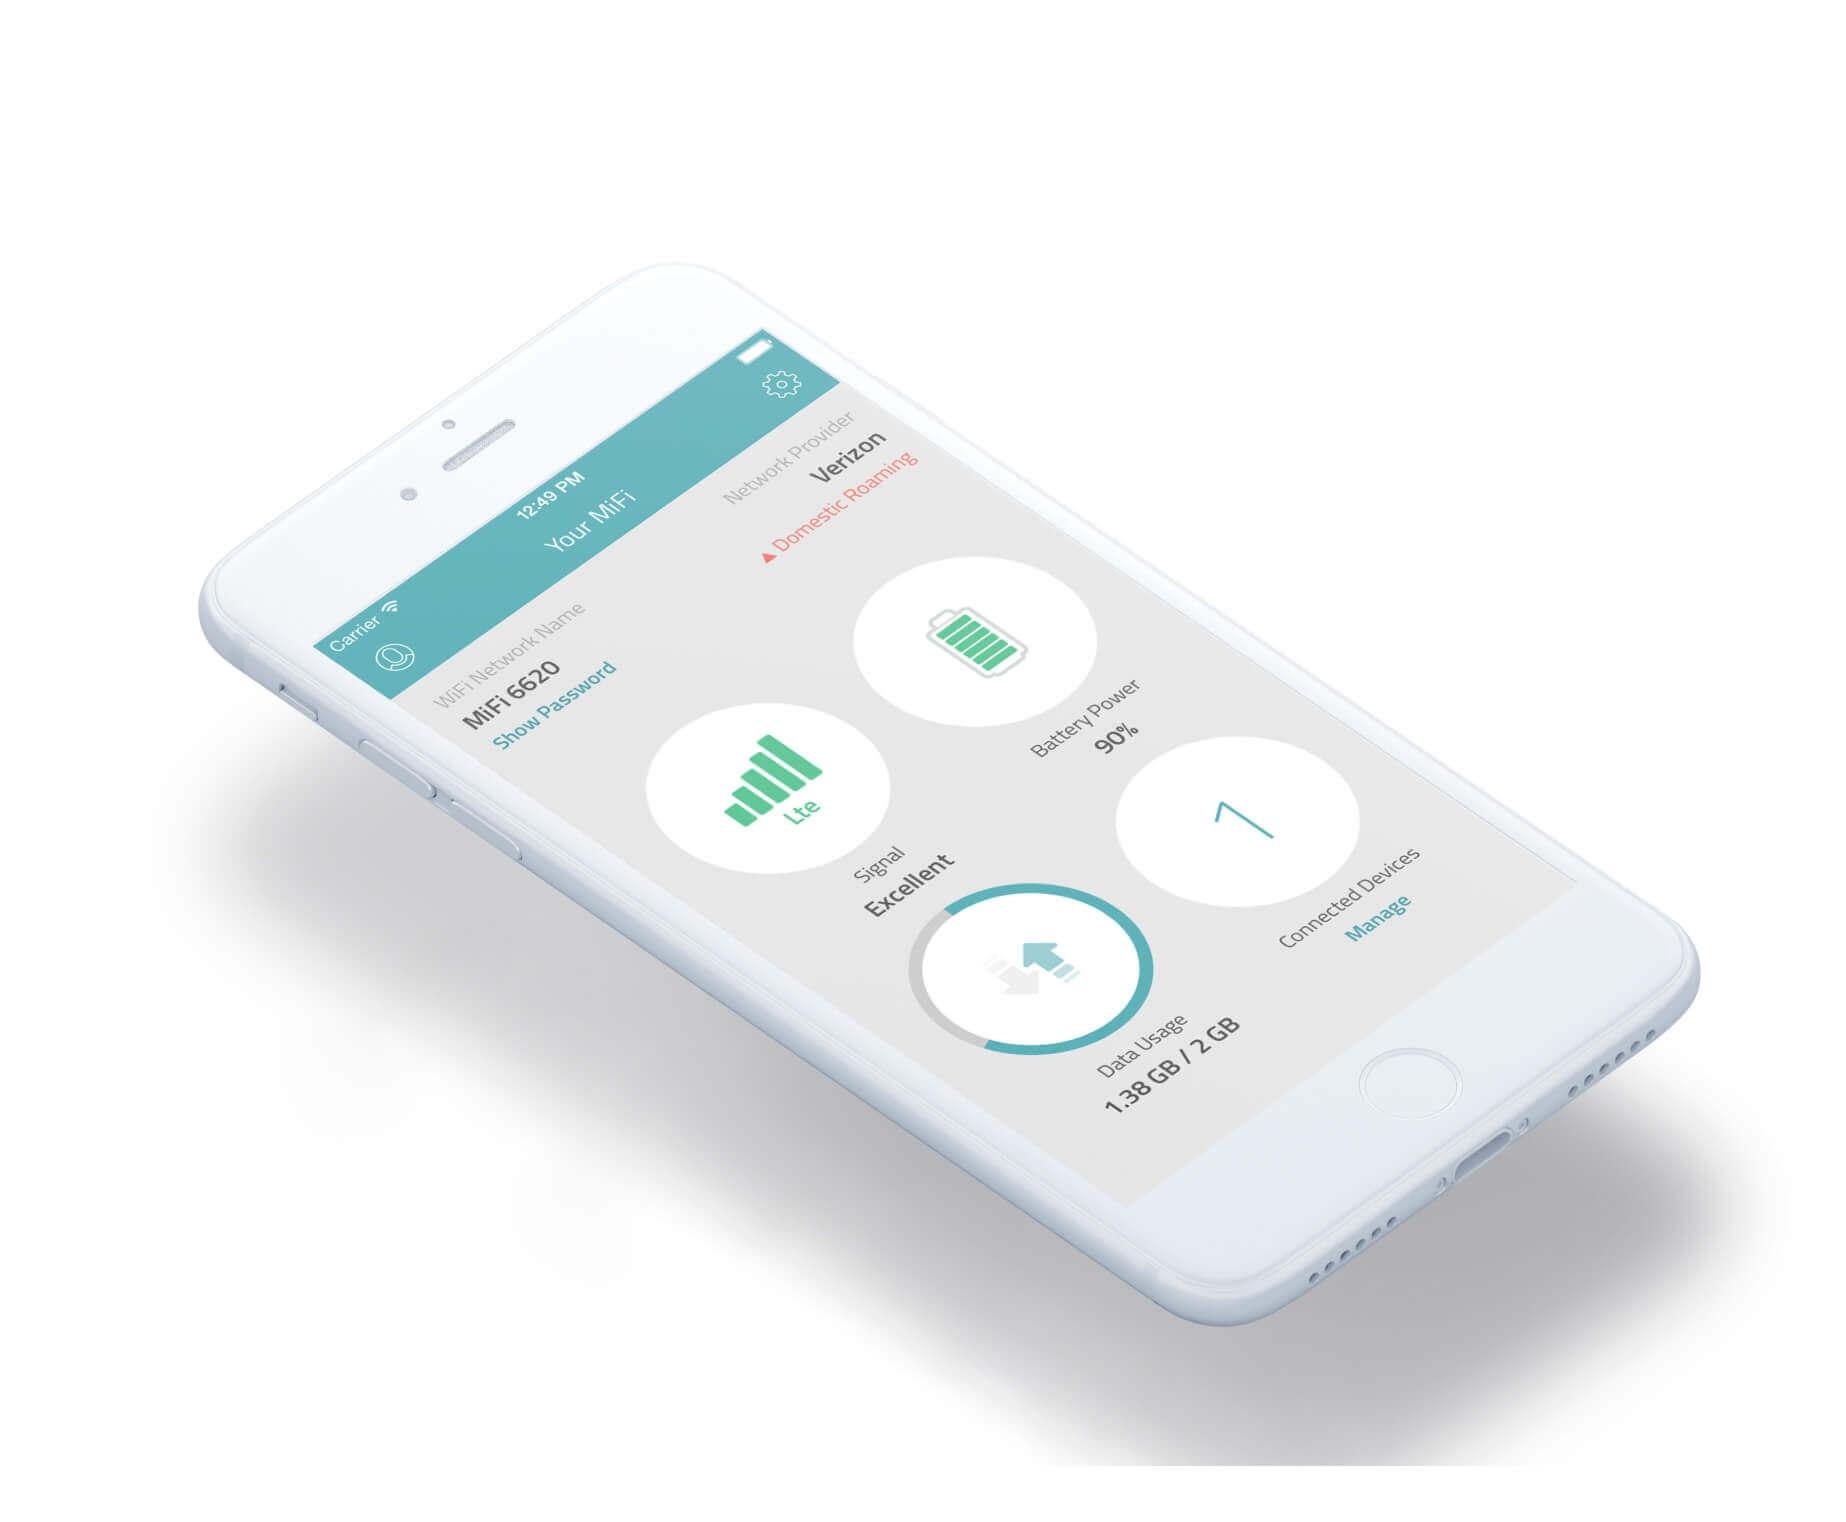 MiFi Mobile Platform